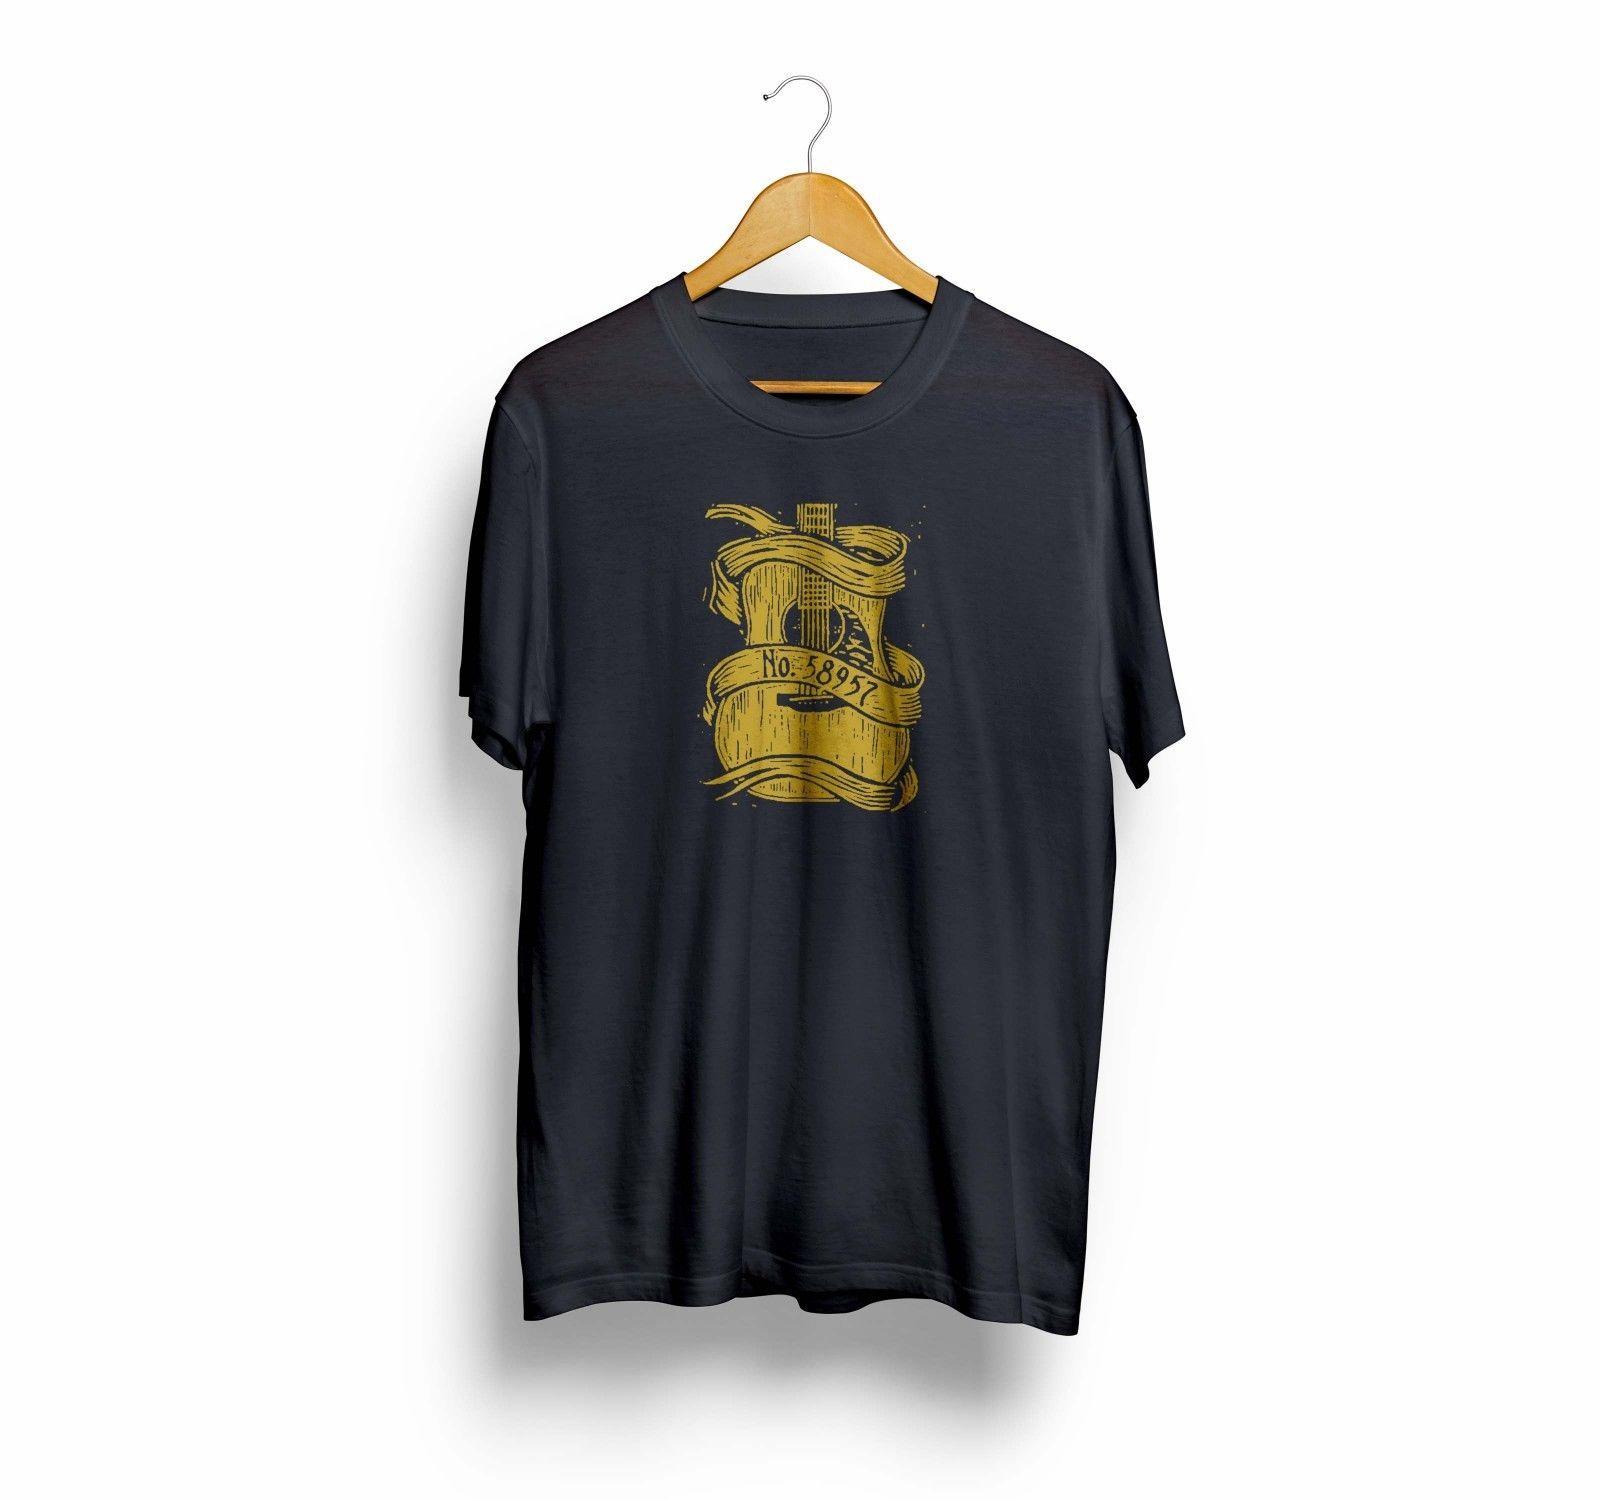 f60ca1807 Tony Rice Bluegrass Cf Marti Acoustic Guitar Men & Women T Shirt T Shirt  Tees 2018 New Short Sleeve Men T Shirt 100% Cotton Silly T Shirt Make Your  Own Tee ...